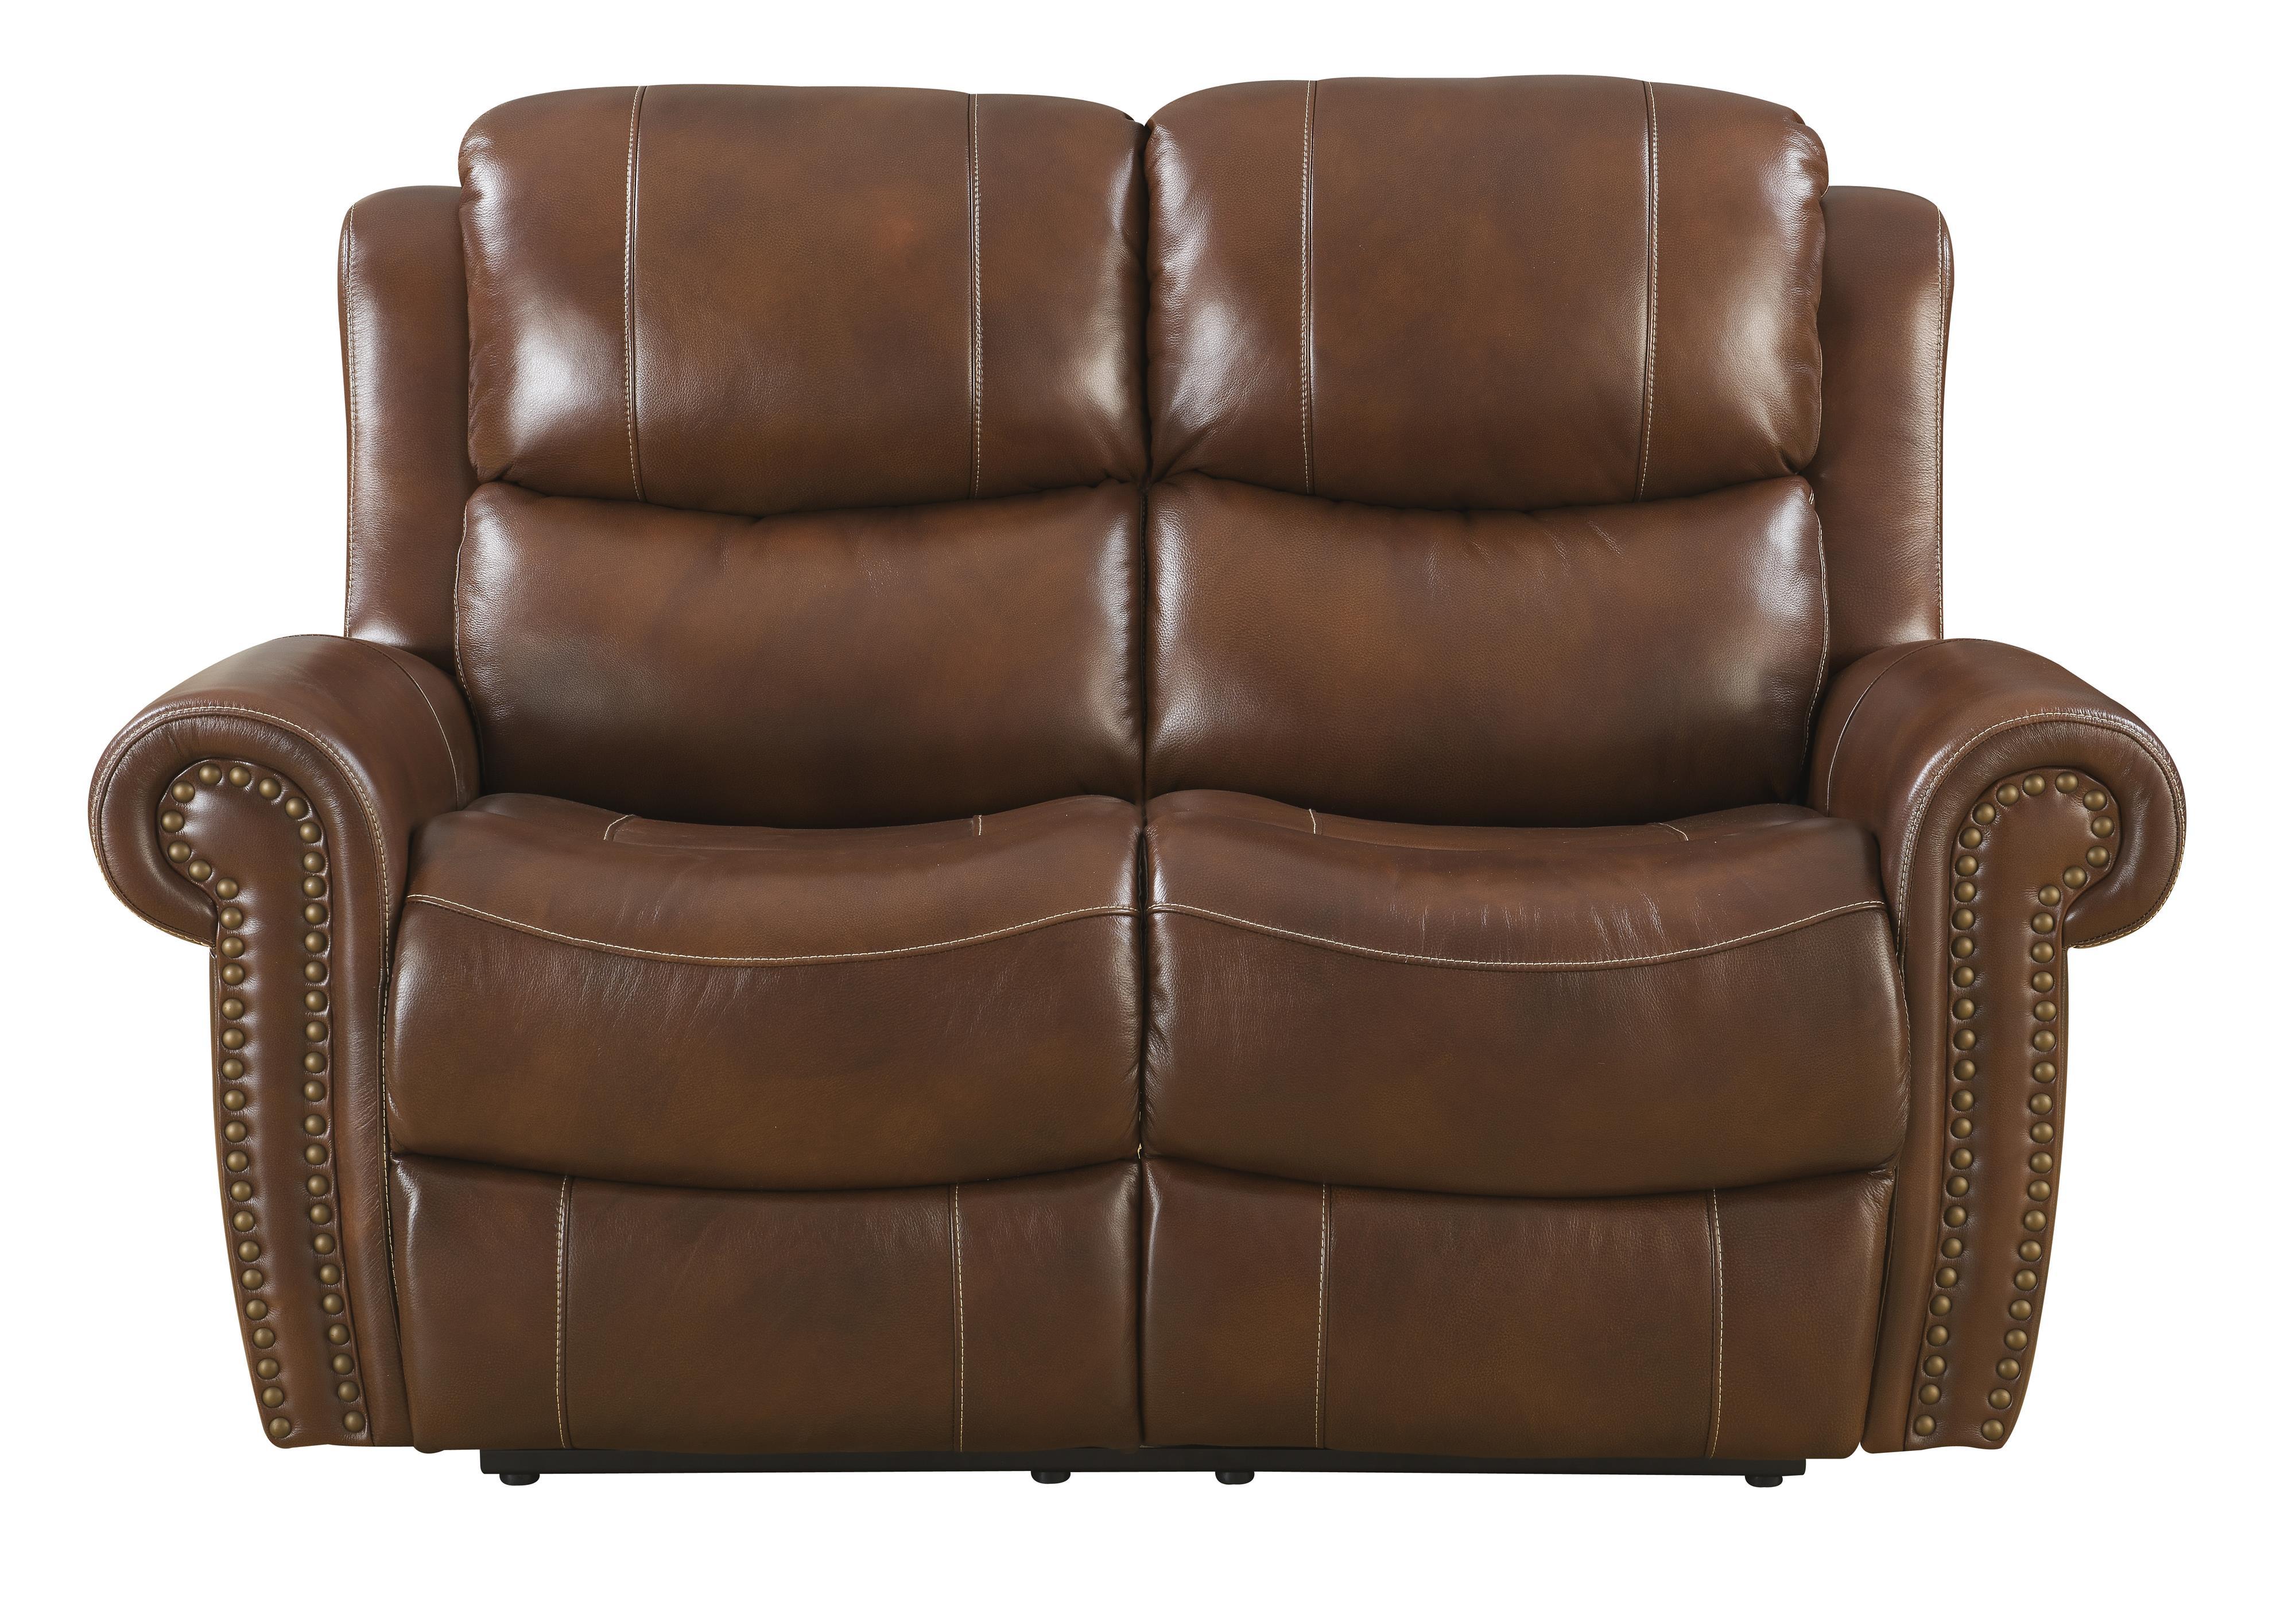 Klaussner International Alomar-US Power Reclining Love Seat - Item Number: ALOMAR-US PWRLS-KilkChoc